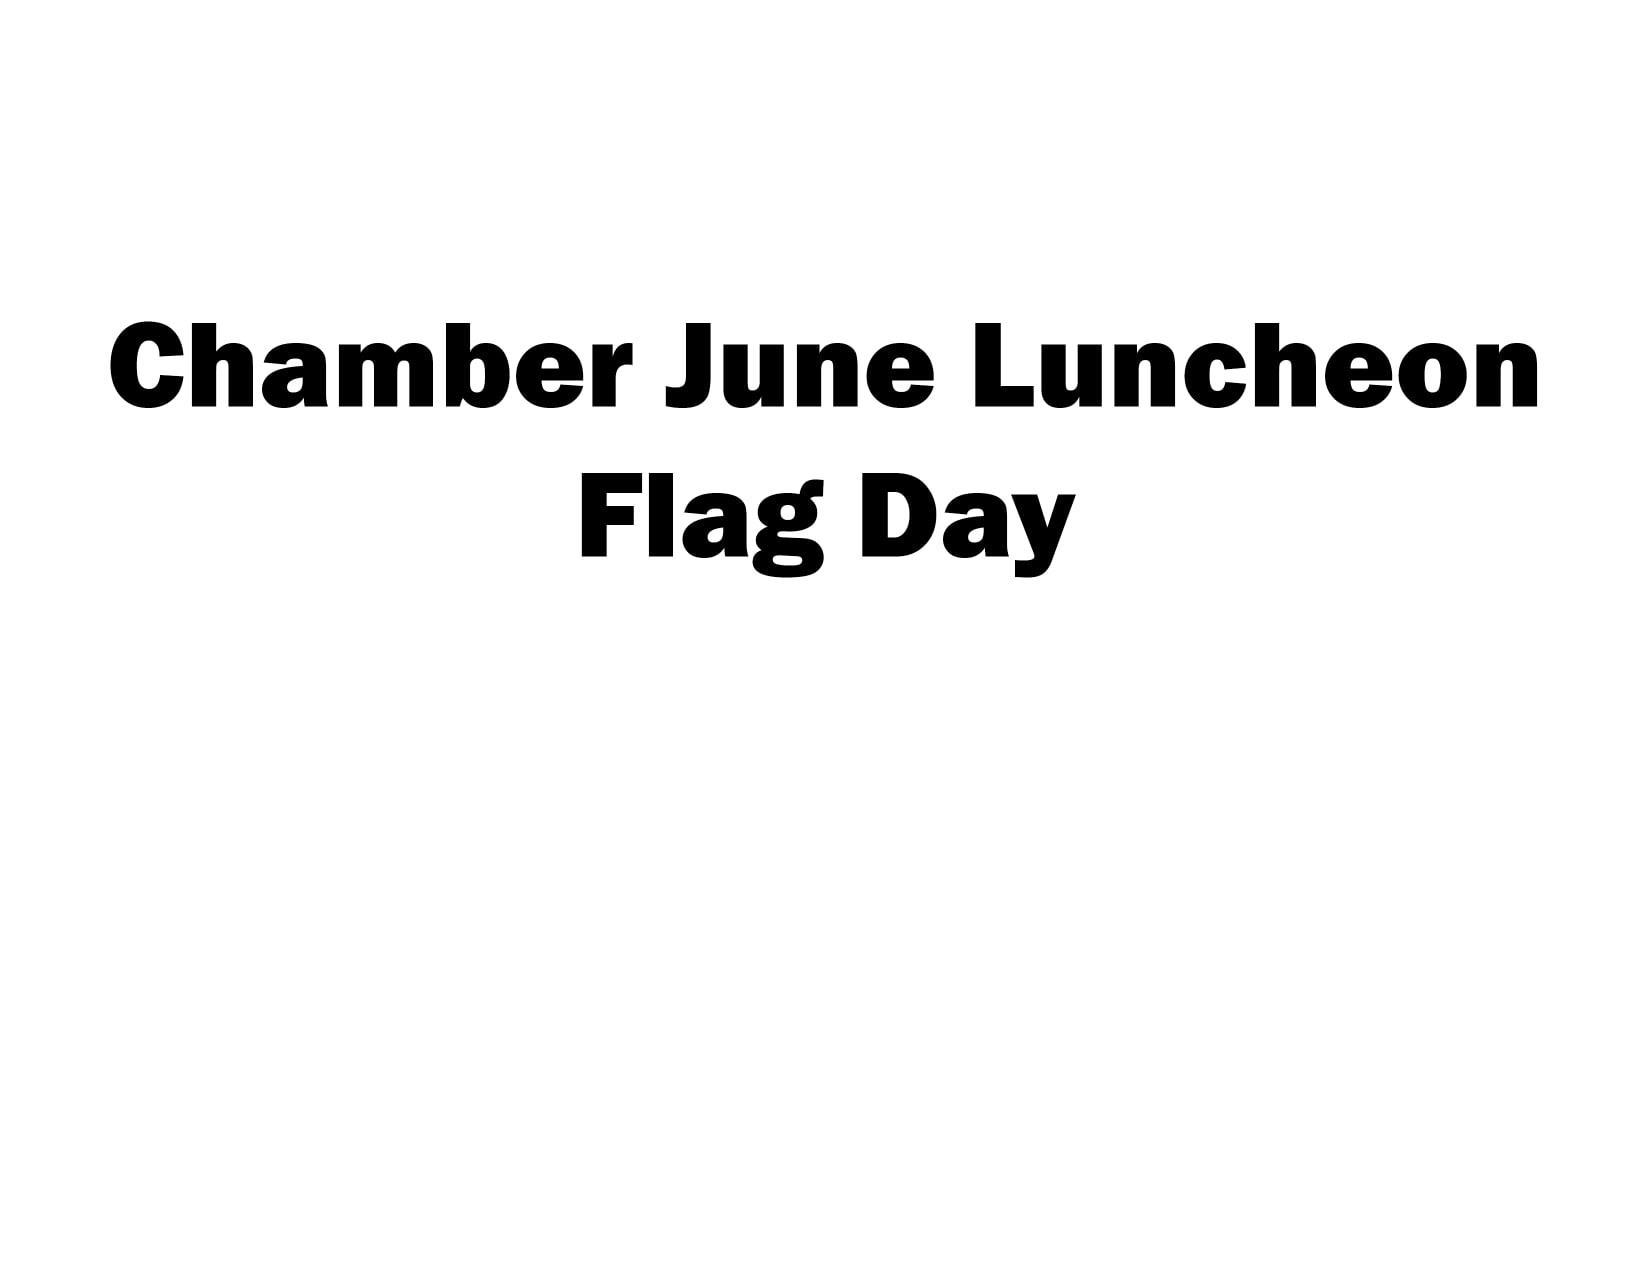 June-Luncheon-w1650.jpg